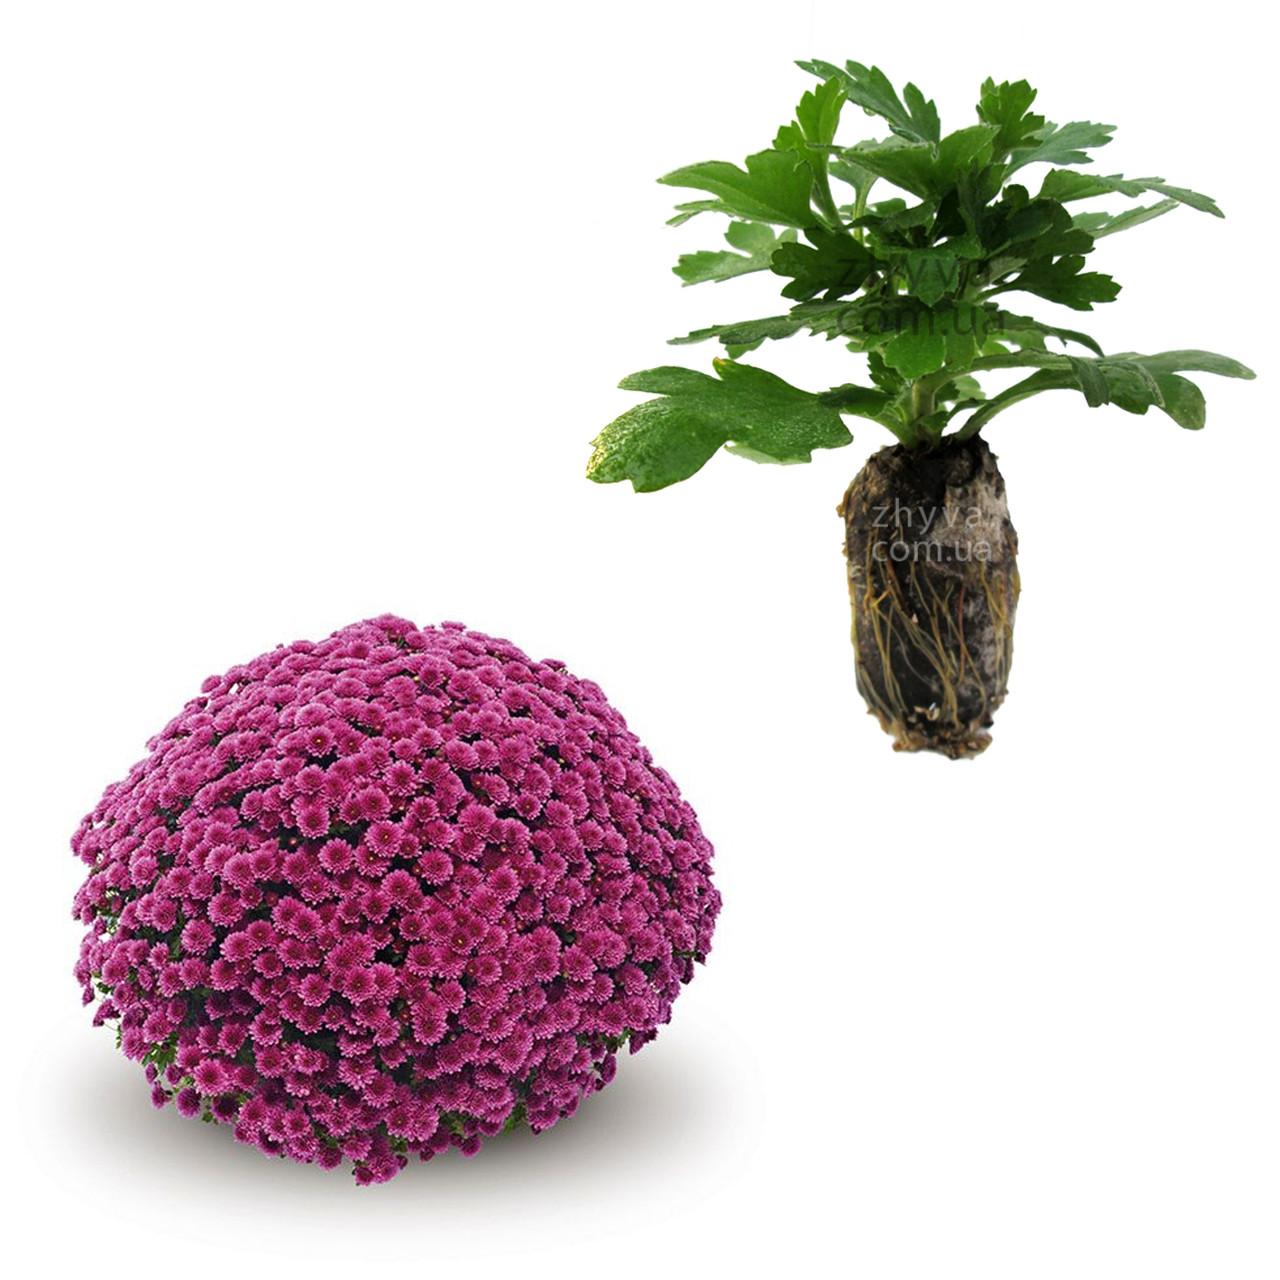 "Саджанці Хризантема Multiflora ""Jasoda Mauve'' 1шт / Рассада Хризантема Multiflora ""Jasoda Mauve''"